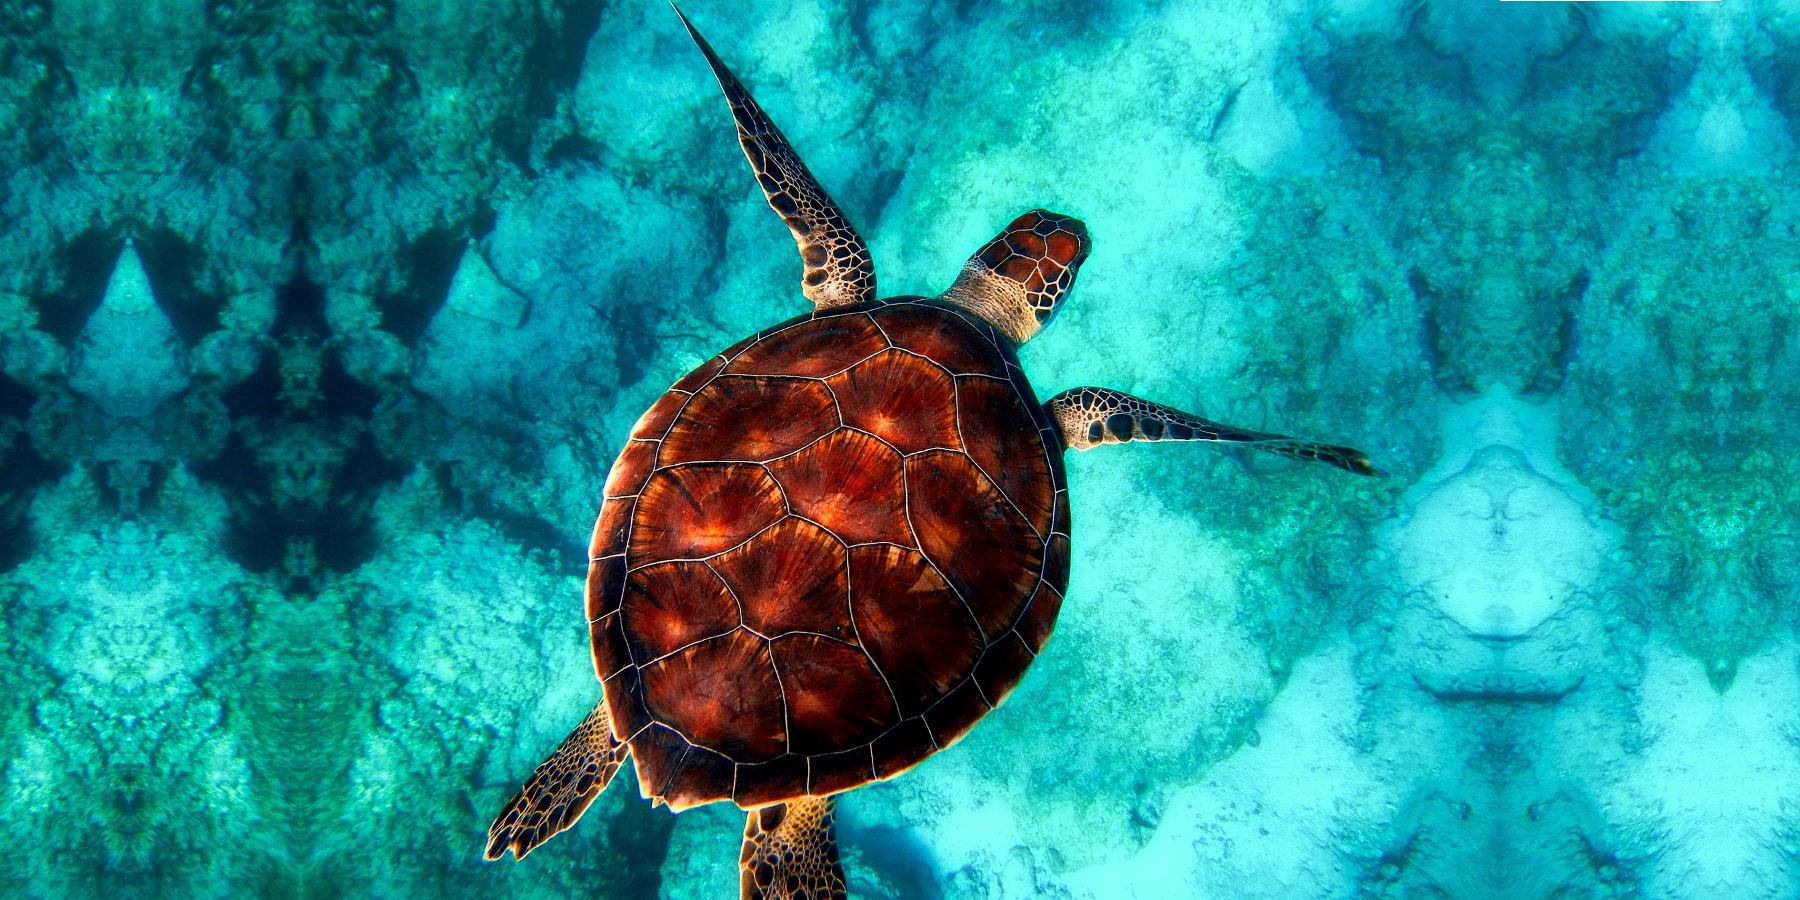 Diving e immersioni in sicurezza: i suggerimenti da tenere sempre a mente